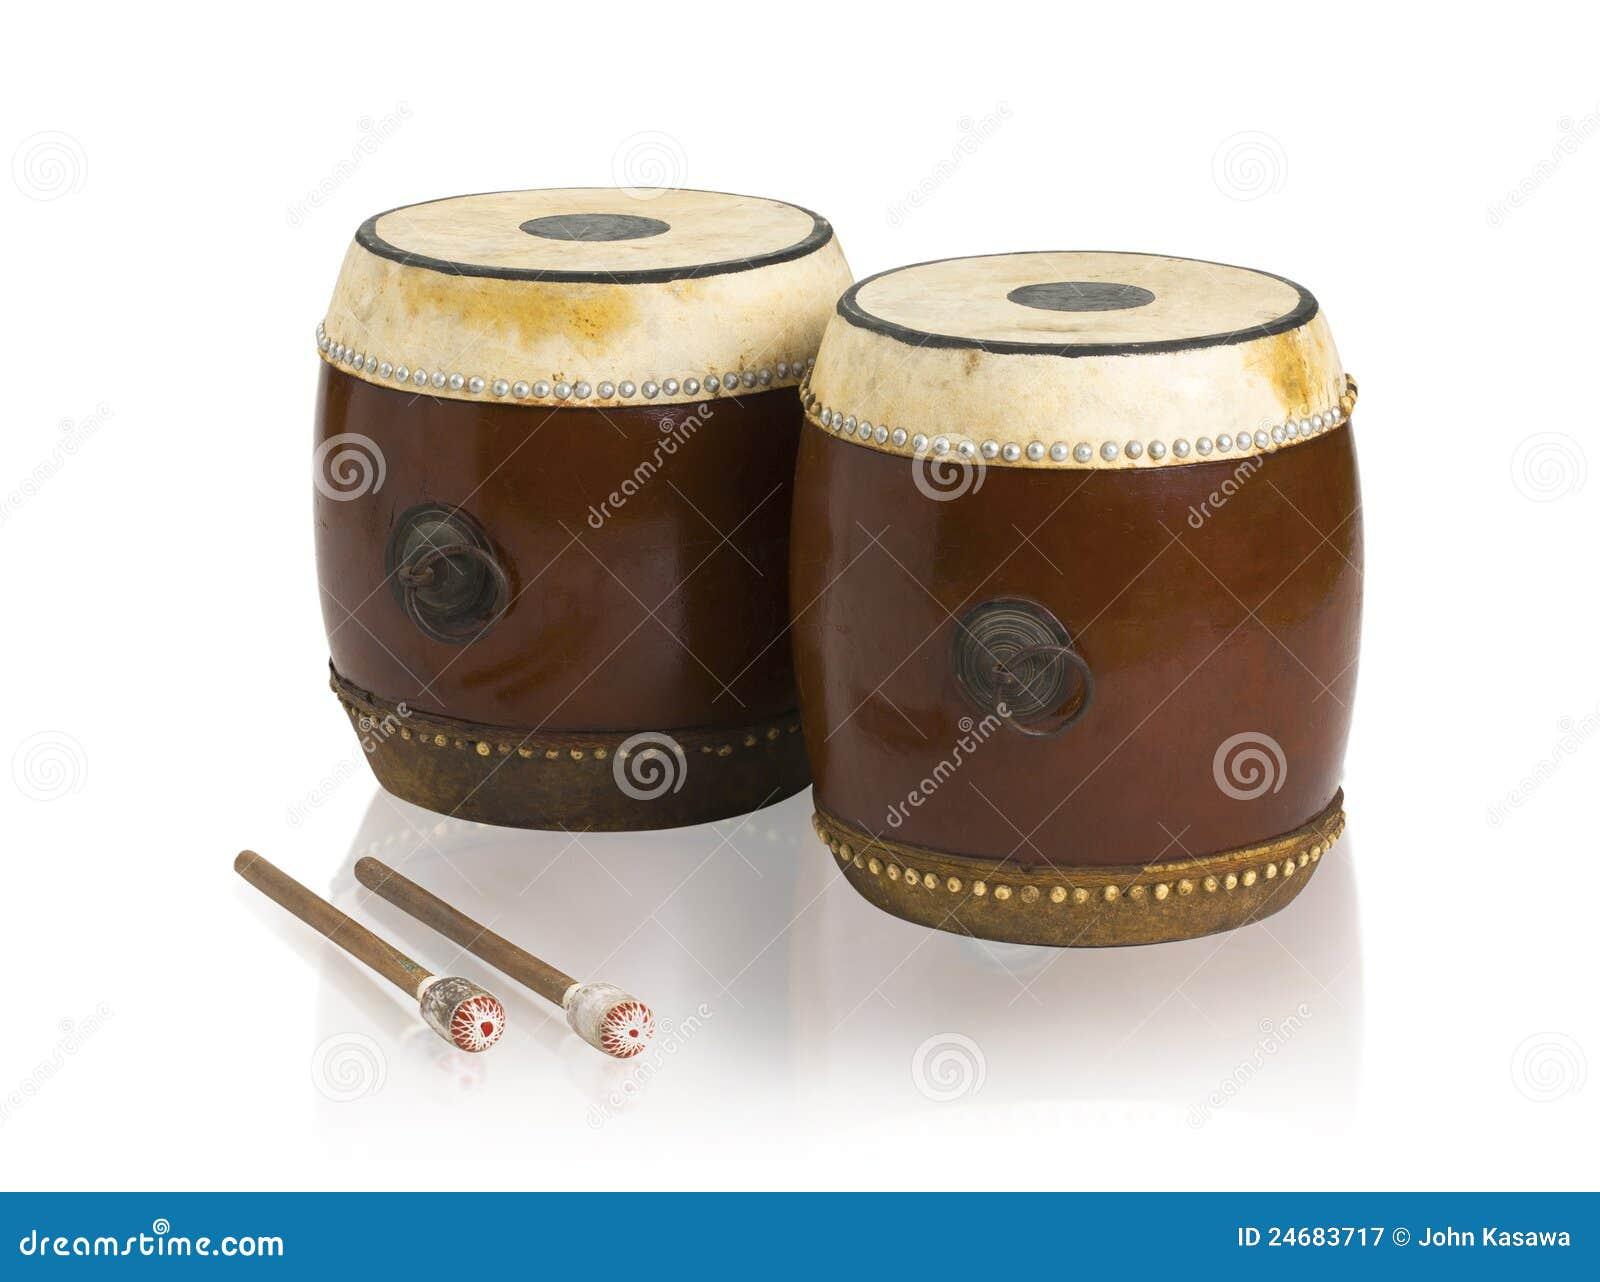 Thai Drums Music Instrument Stock Image - Image: 24683717